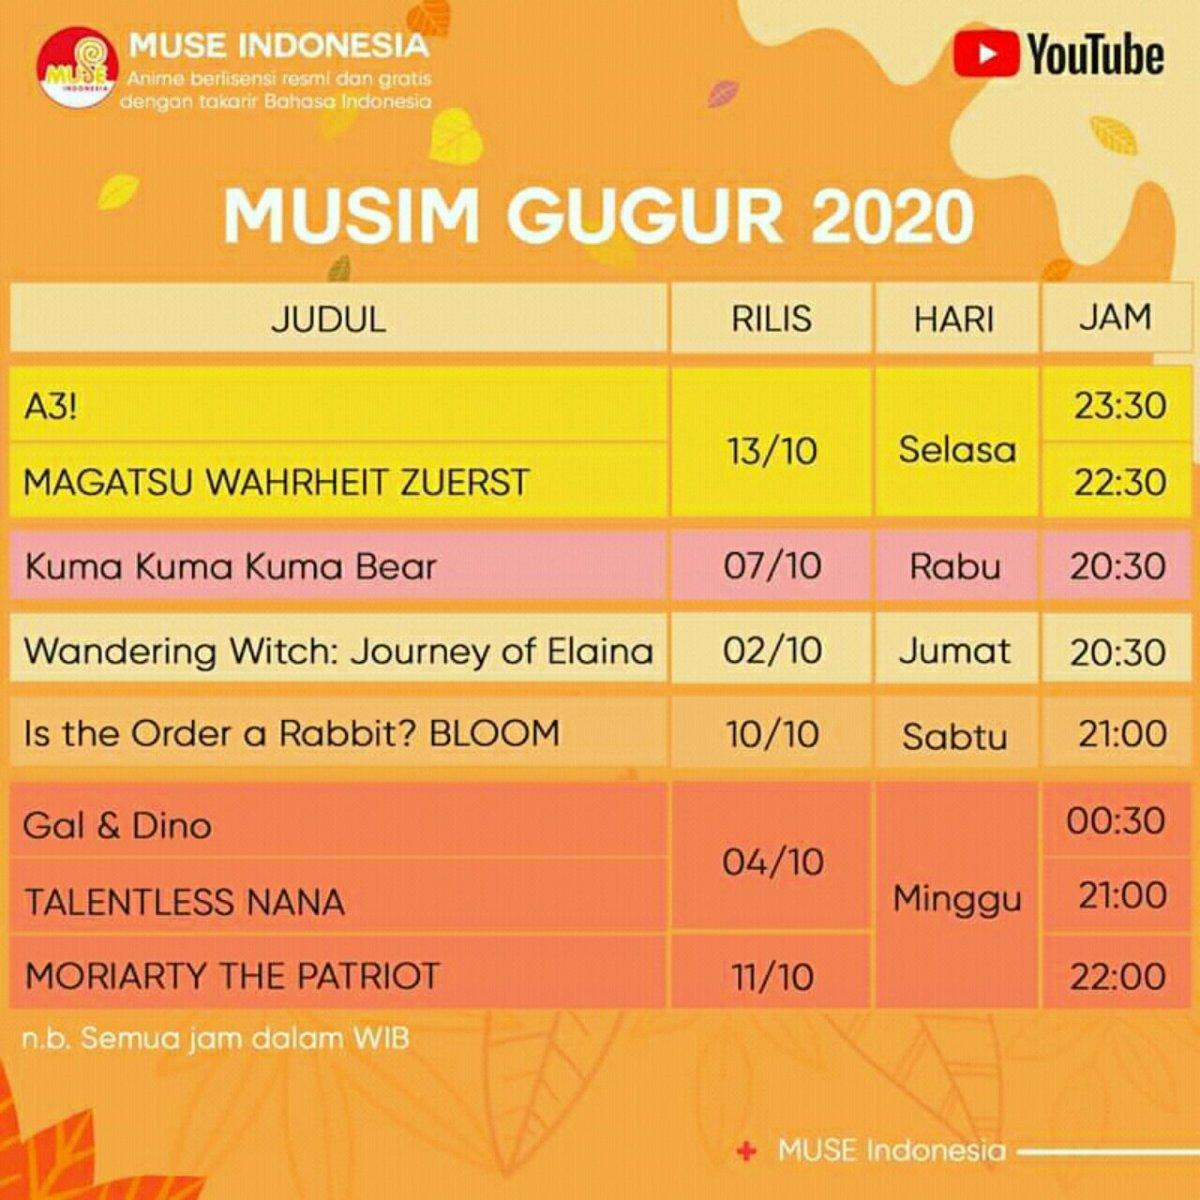 Muse Indonesia akan Menayangkan Anime Wandering Witch: The Journey of Elaina, Kuma Kuma Kuma Bear, Is the Order a Rabbit? BLOOM 10